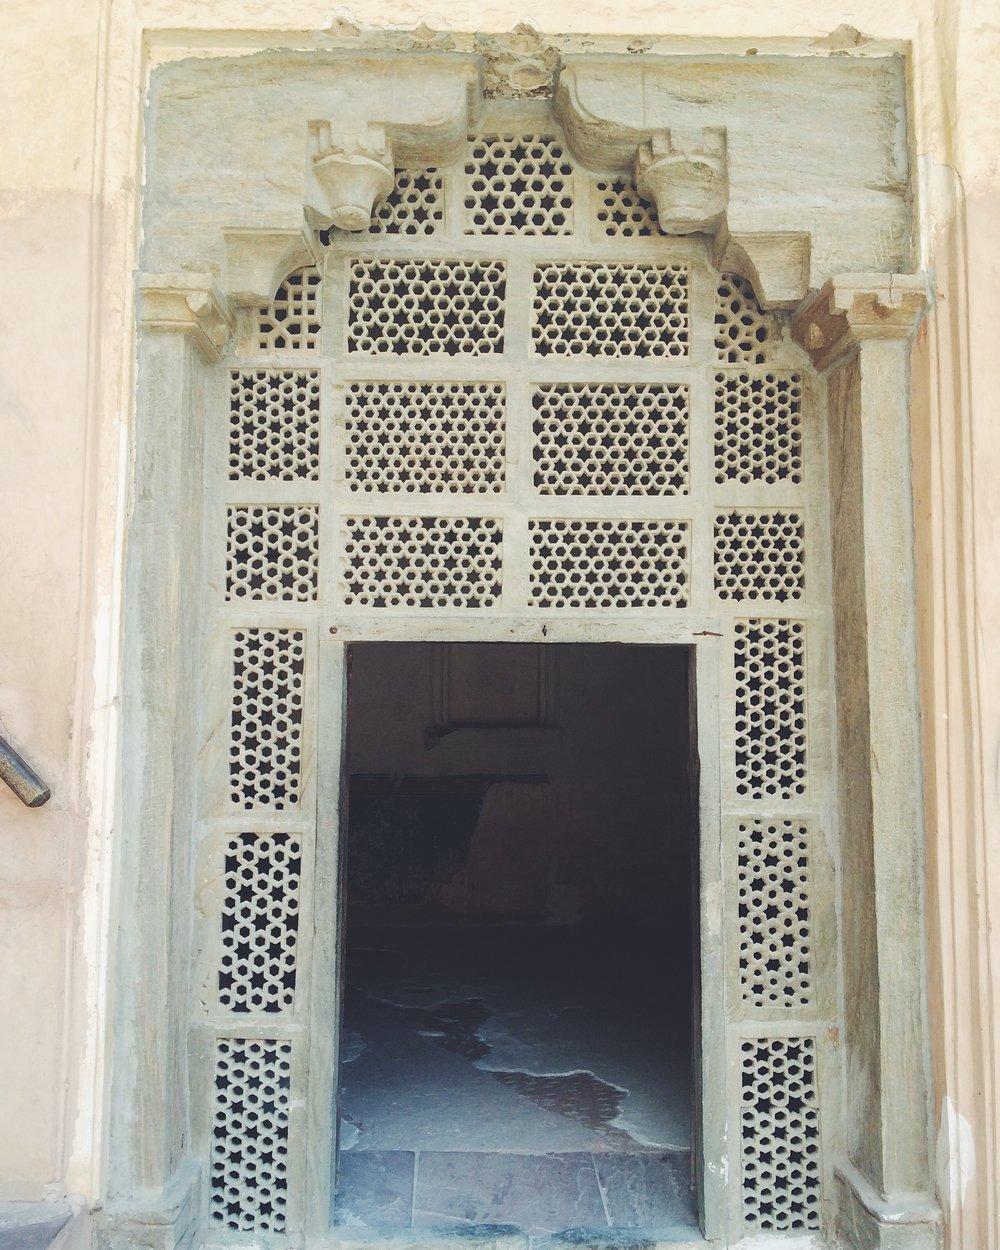 Jaipur, Rajasthan, India.